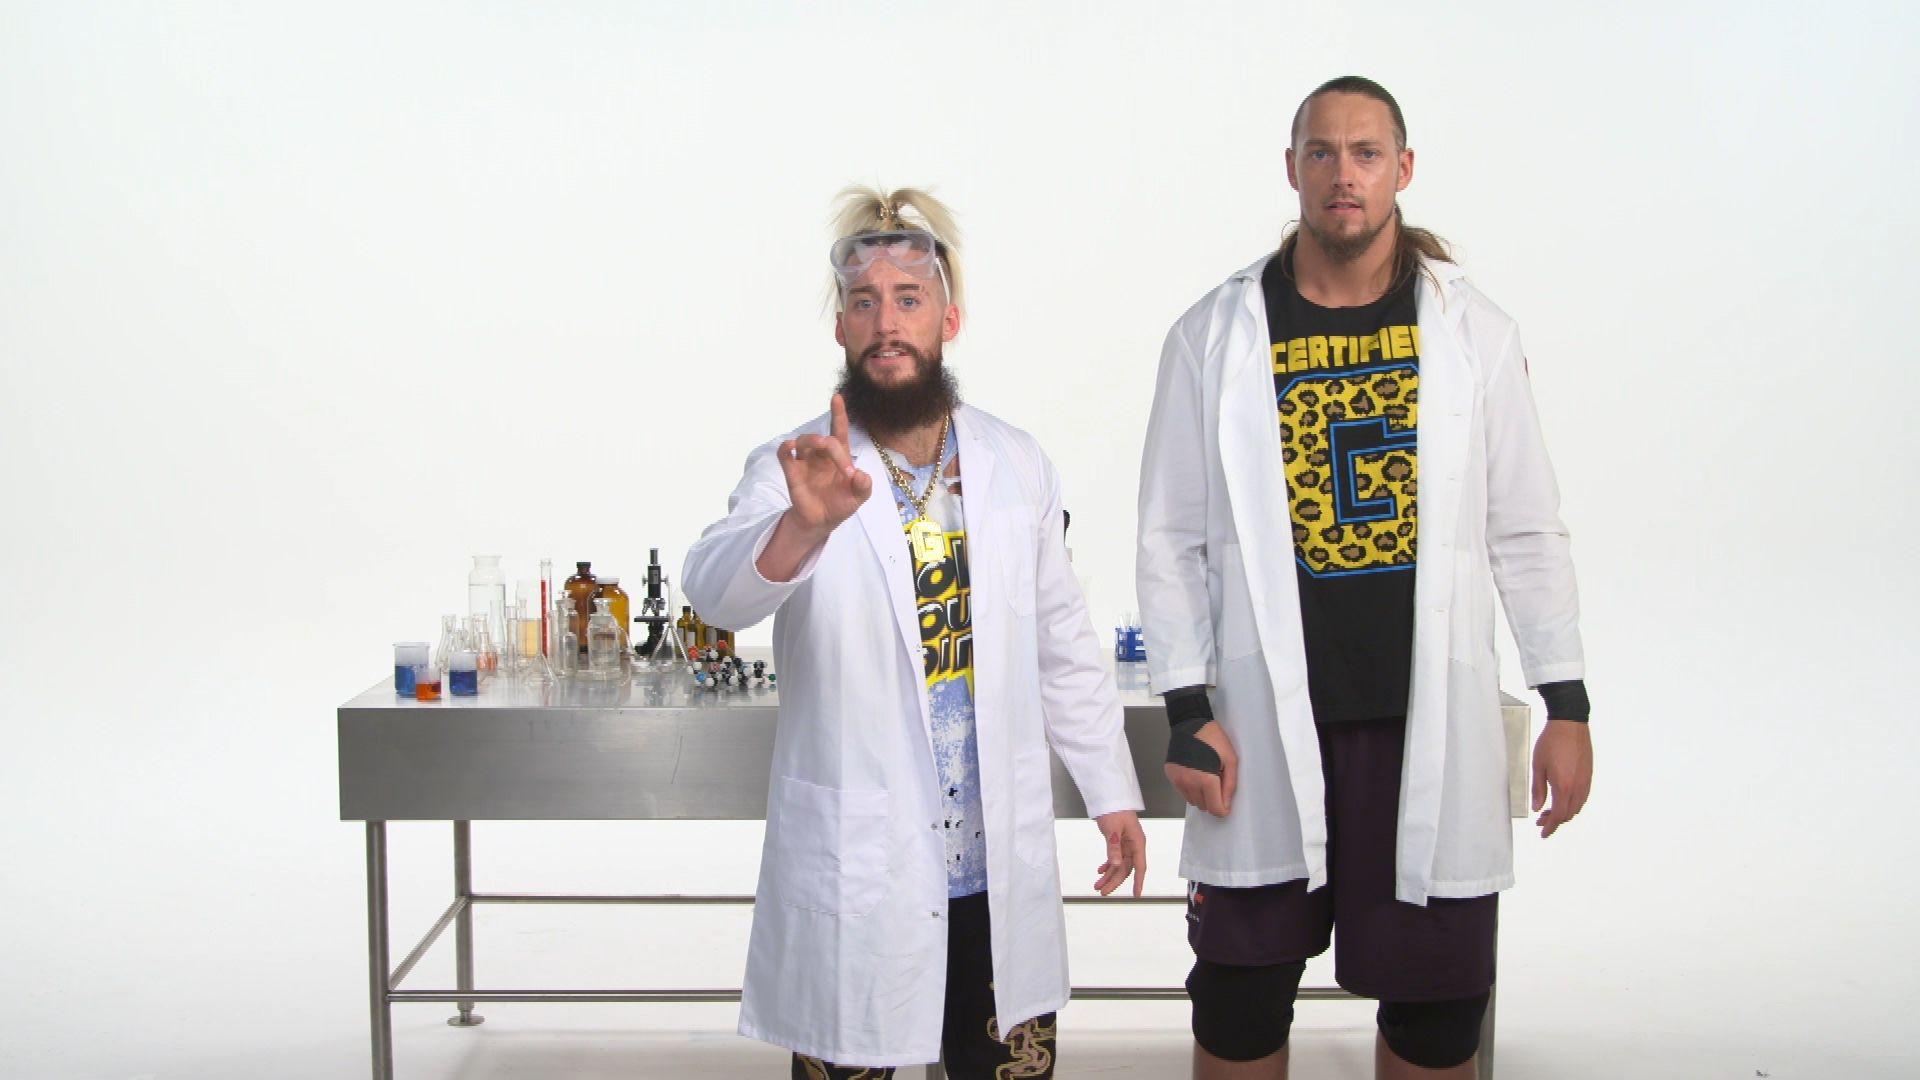 WWE Network Subscription Wwe, Video on demand, Summerslam